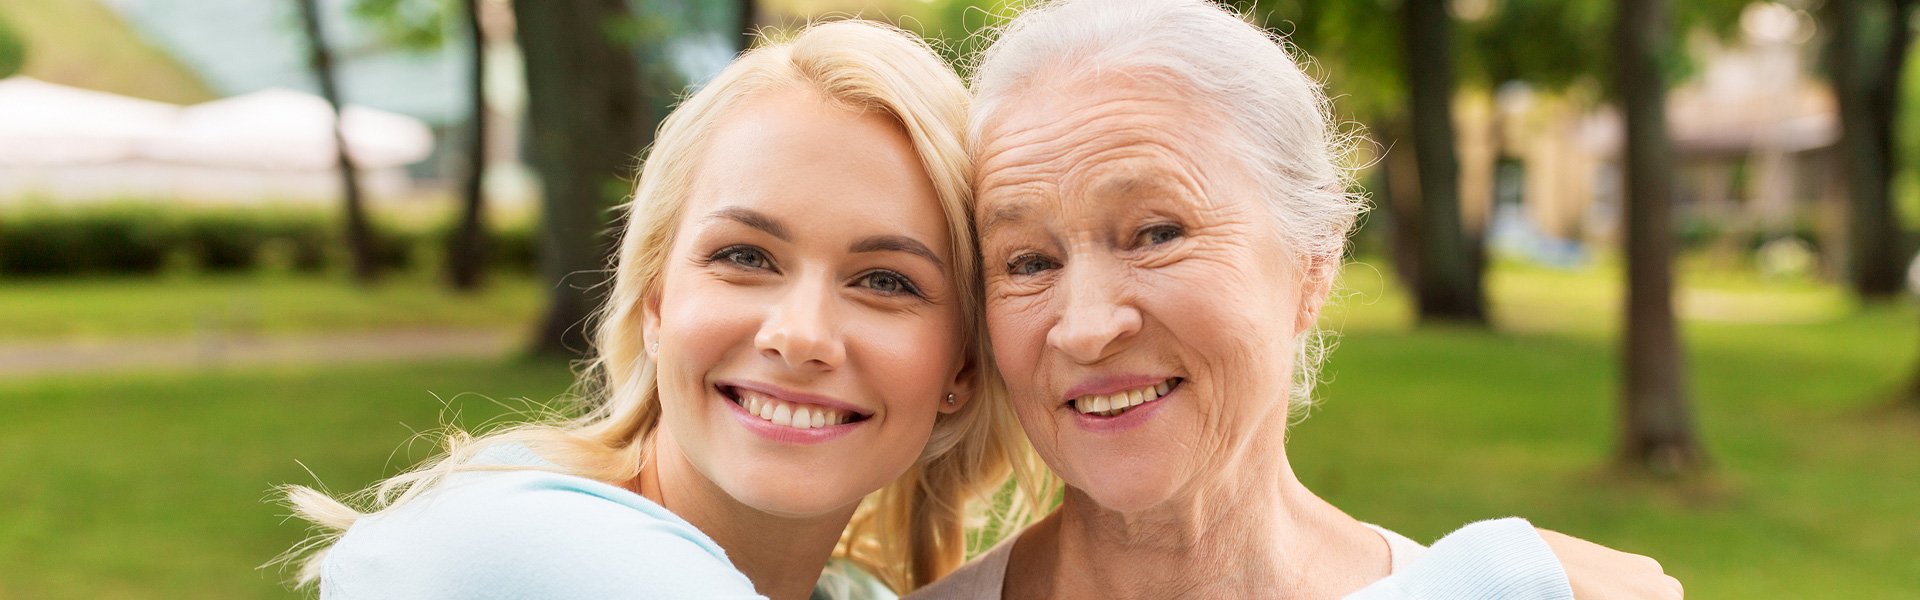 Oral Cancer Screenings Basics